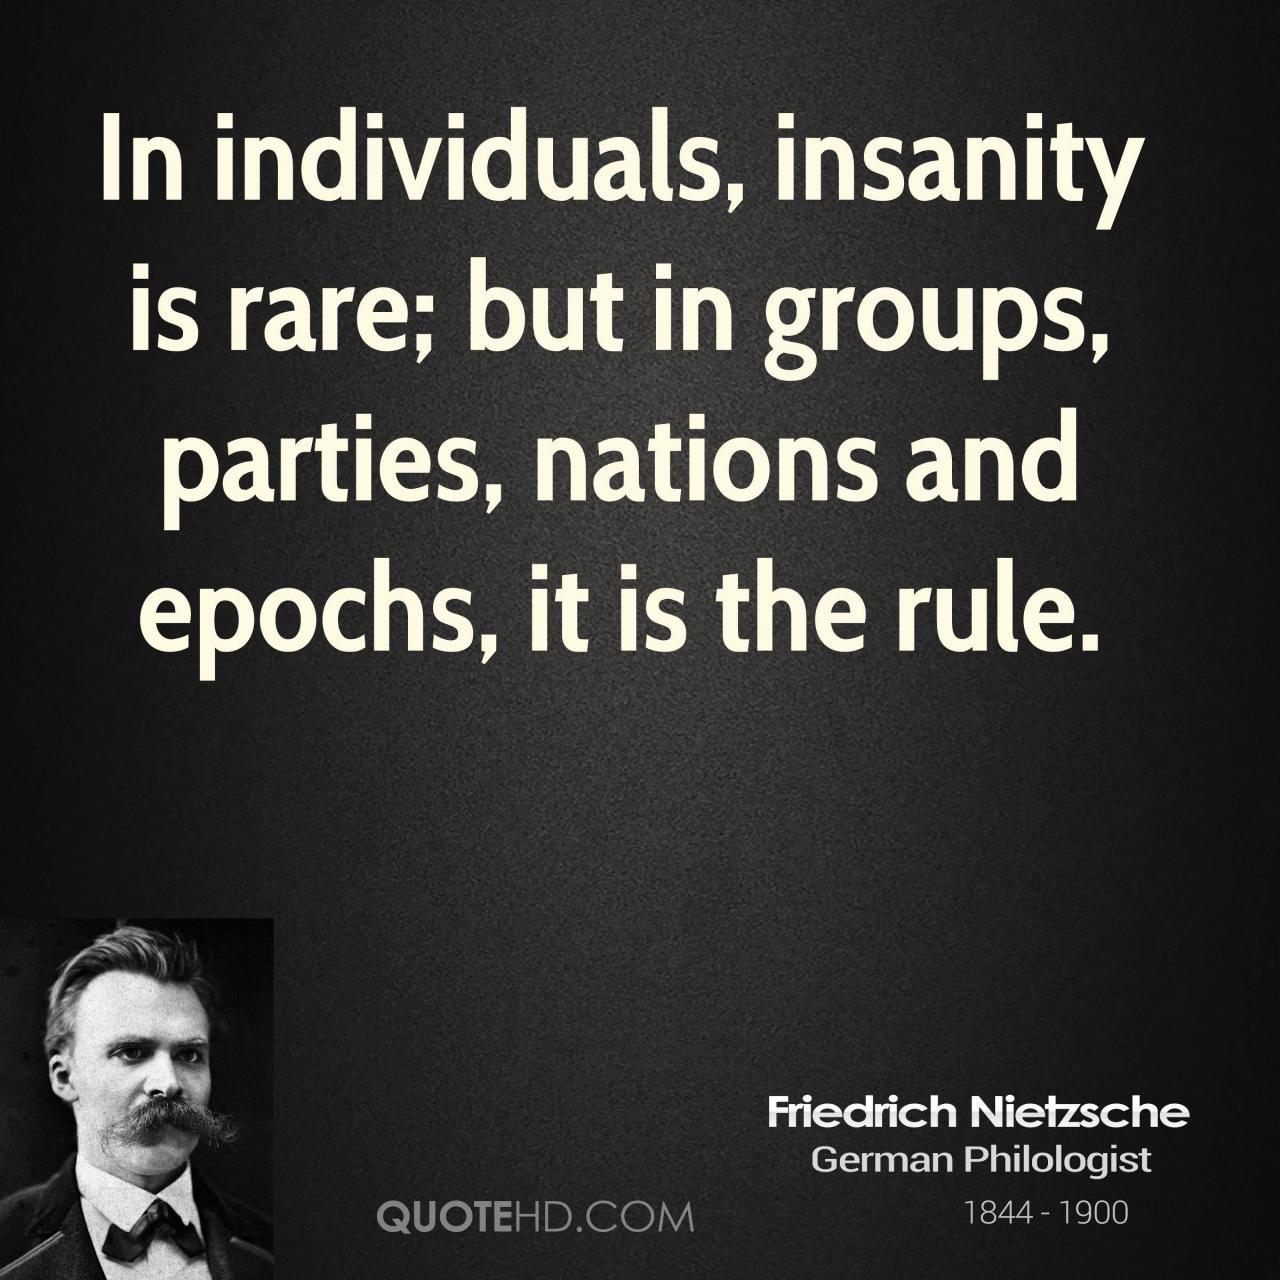 Nietzschequotes Friedrich Nietzsche Quotes More